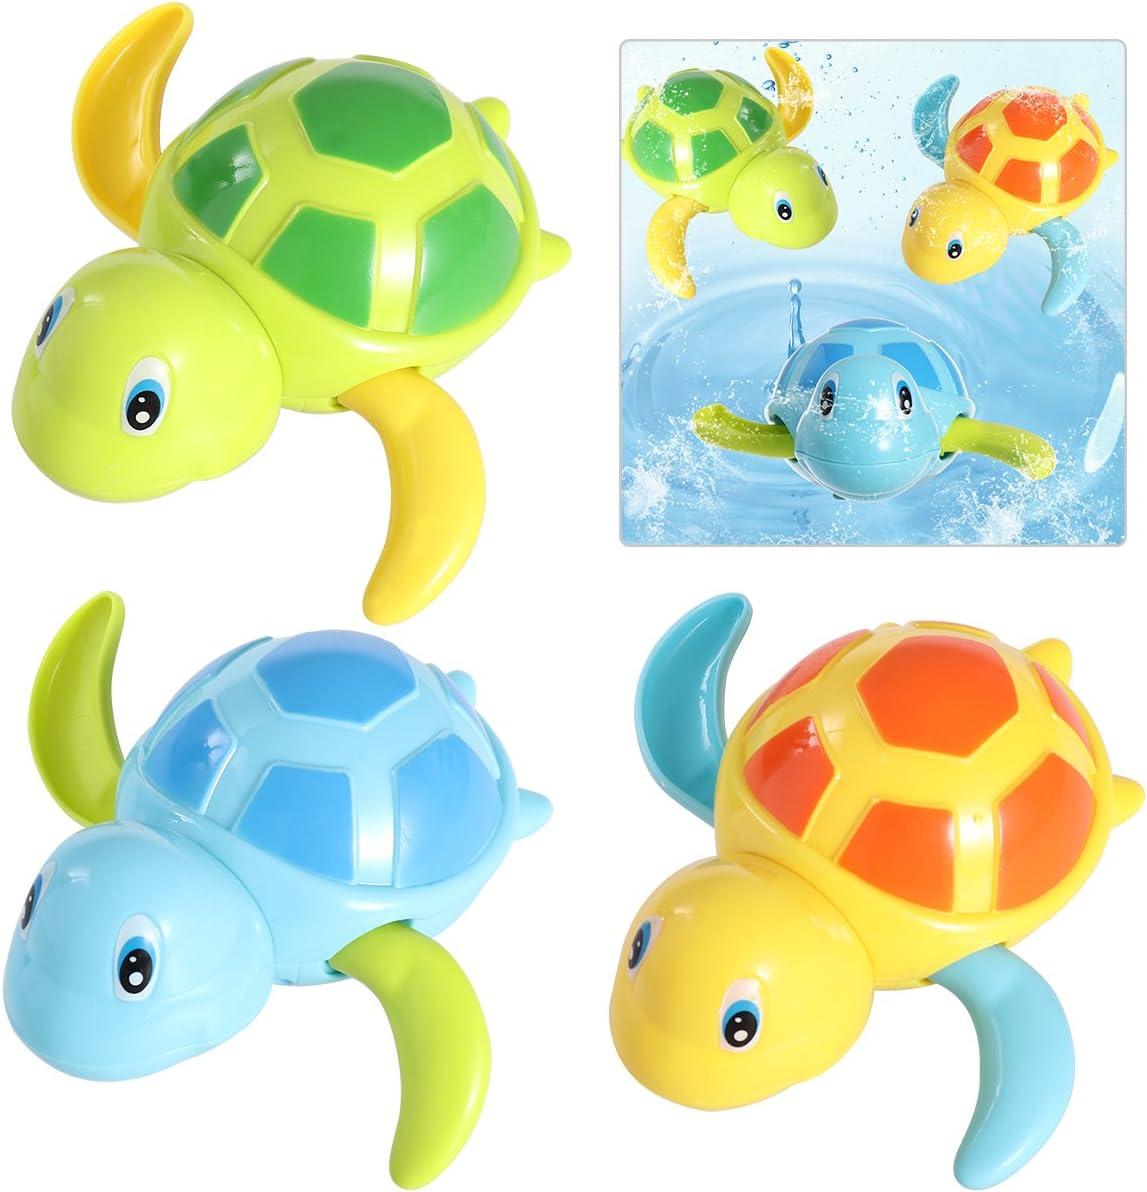 TOYMYTOY 3pcs bebé baño juguetes de natación bañera linda tortuga natación juguetes